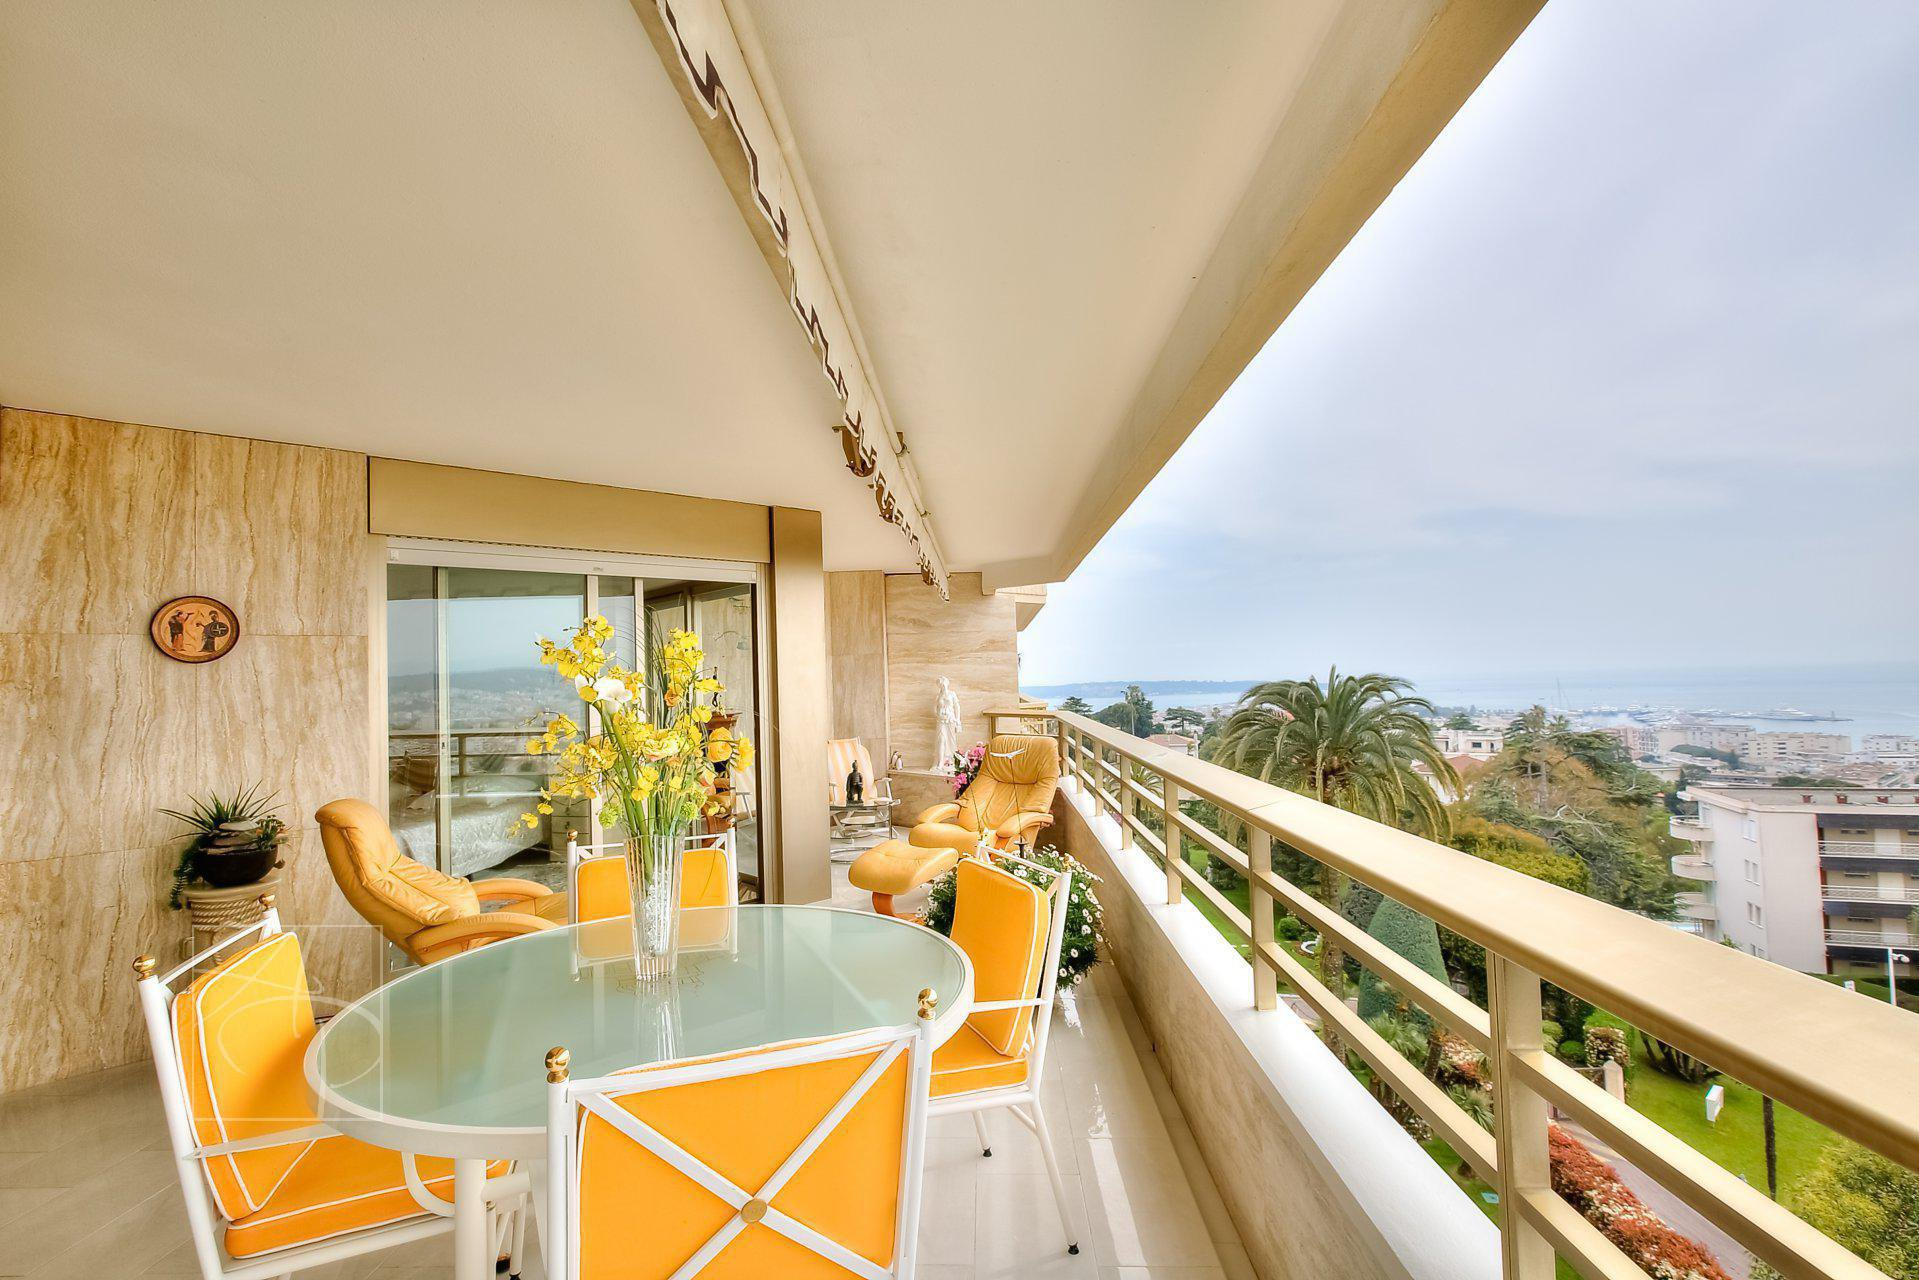 Cannes basse californie LUXUEUSE RESIDENCE PROCHE DU CENTRE VILLE VUE MER ET PISCINE